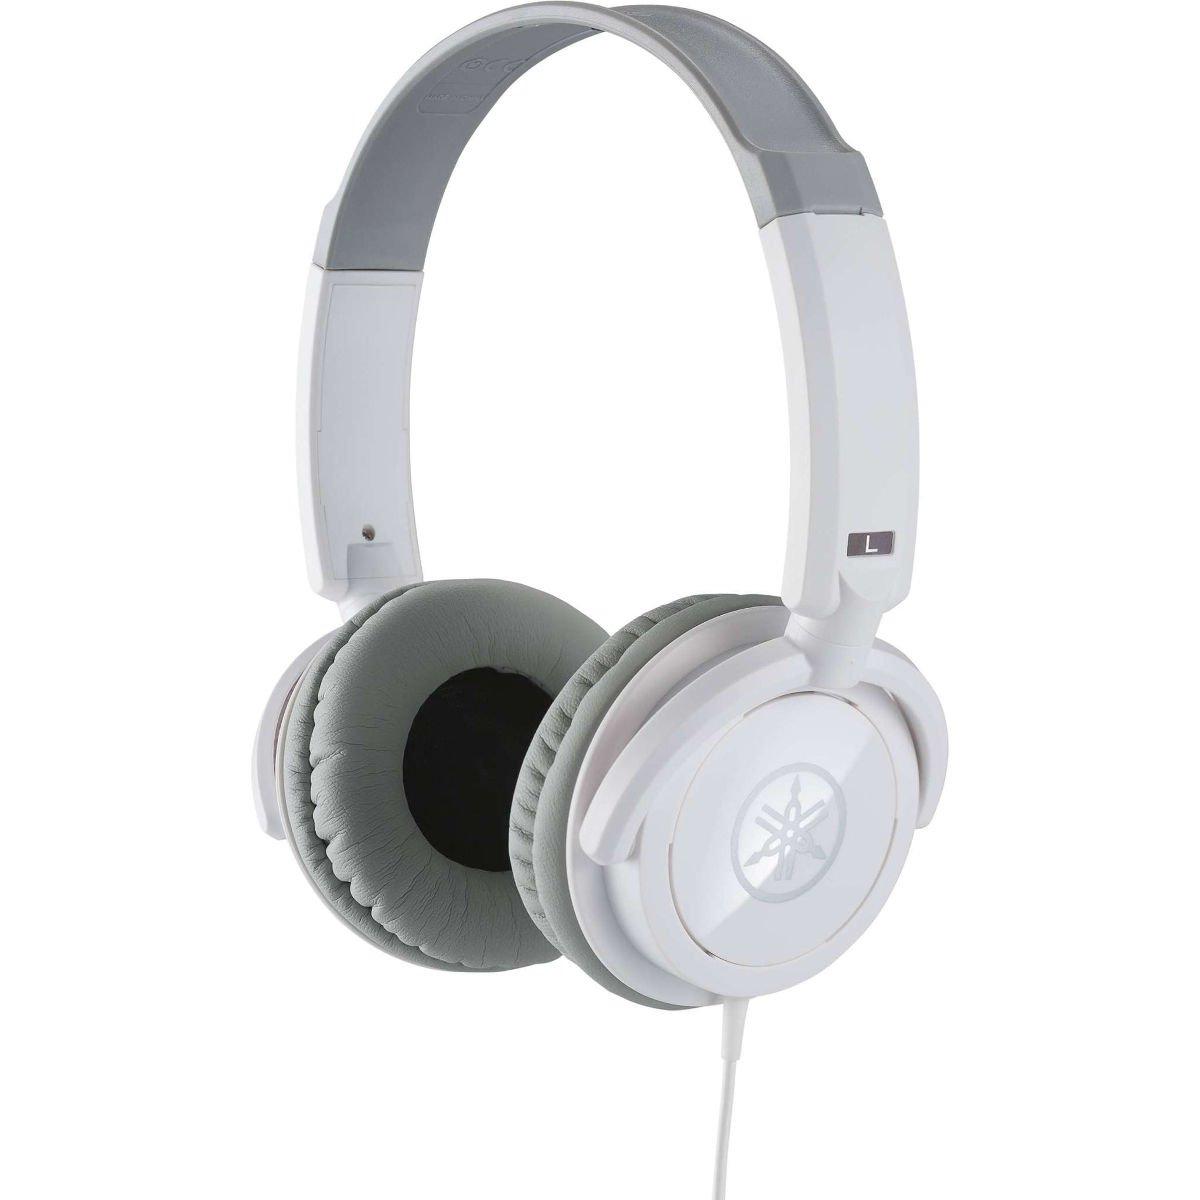 Billede af Yamaha HPH-100 Closed headphone, white